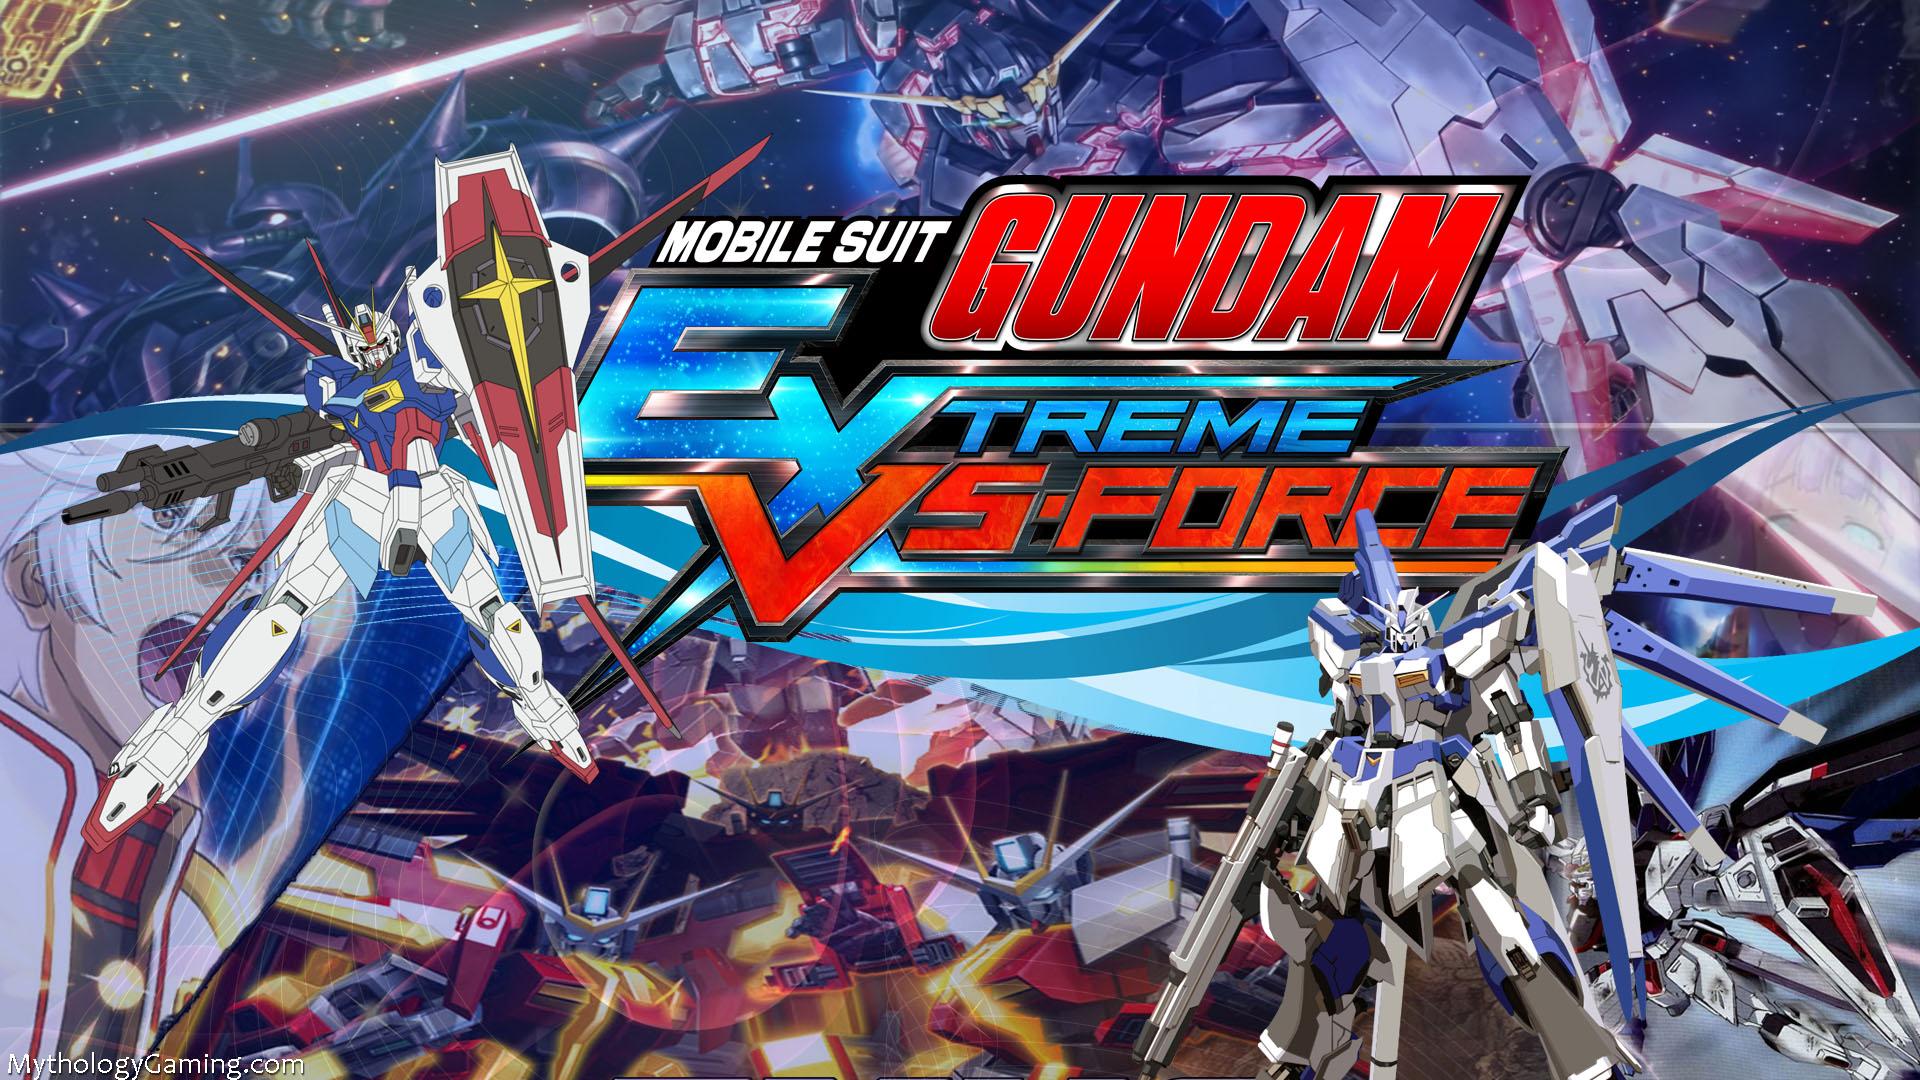 Mobile-Suit-Gundam-Extreme-VS-Force-Brash-Games